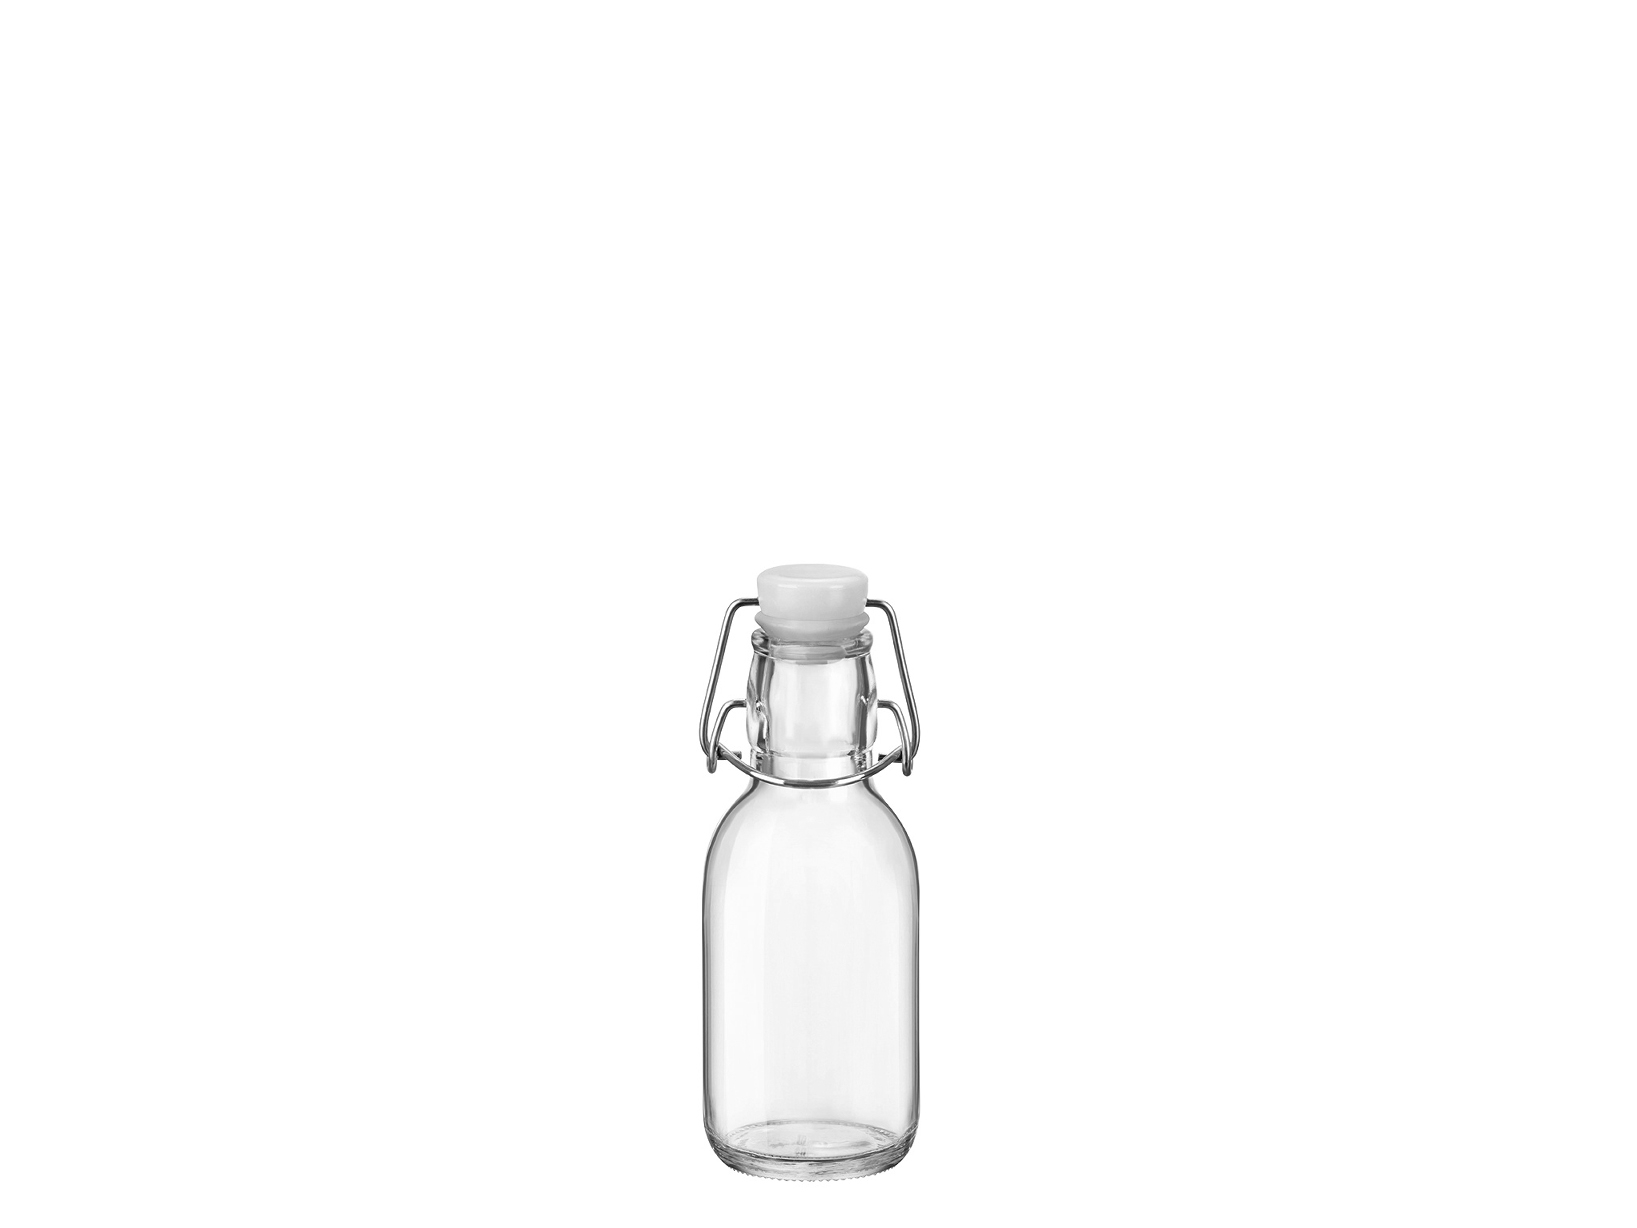 Acquista Set 12 Bottiglia Vetro Emilia 17505307 | Glooke.com